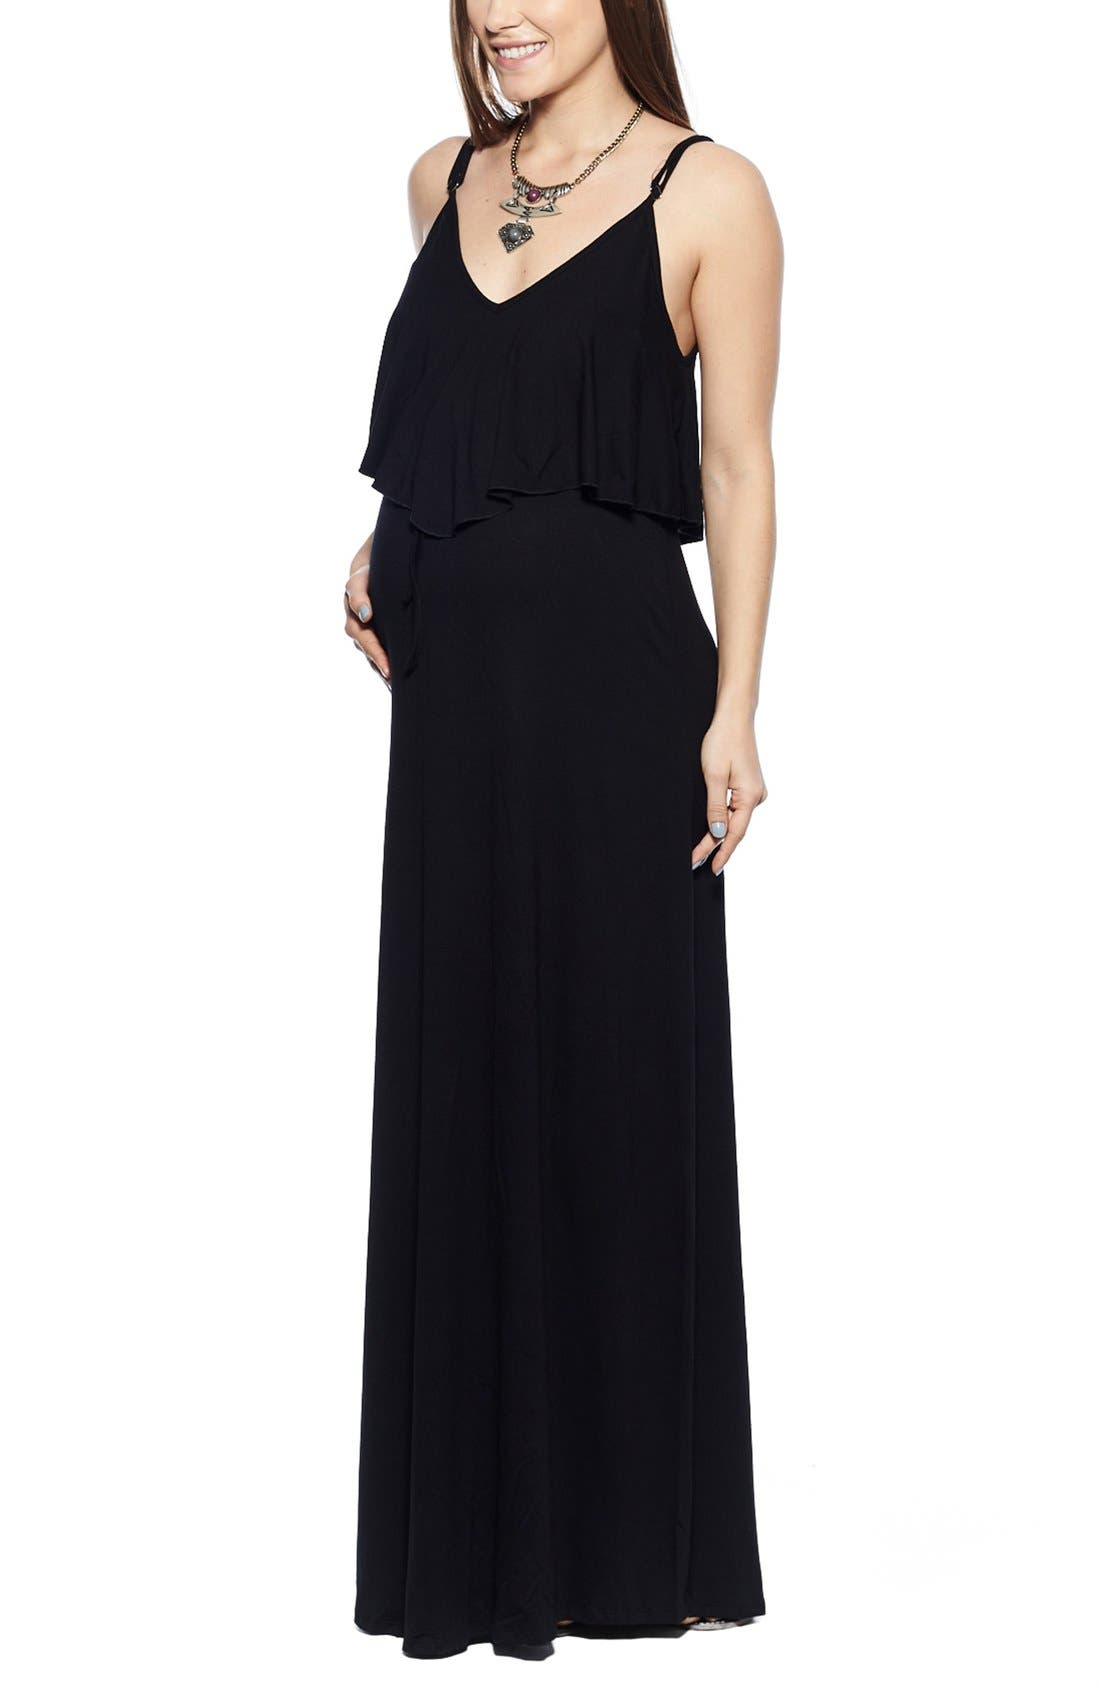 Imanimo Maxi Ruffle Maternity Dress